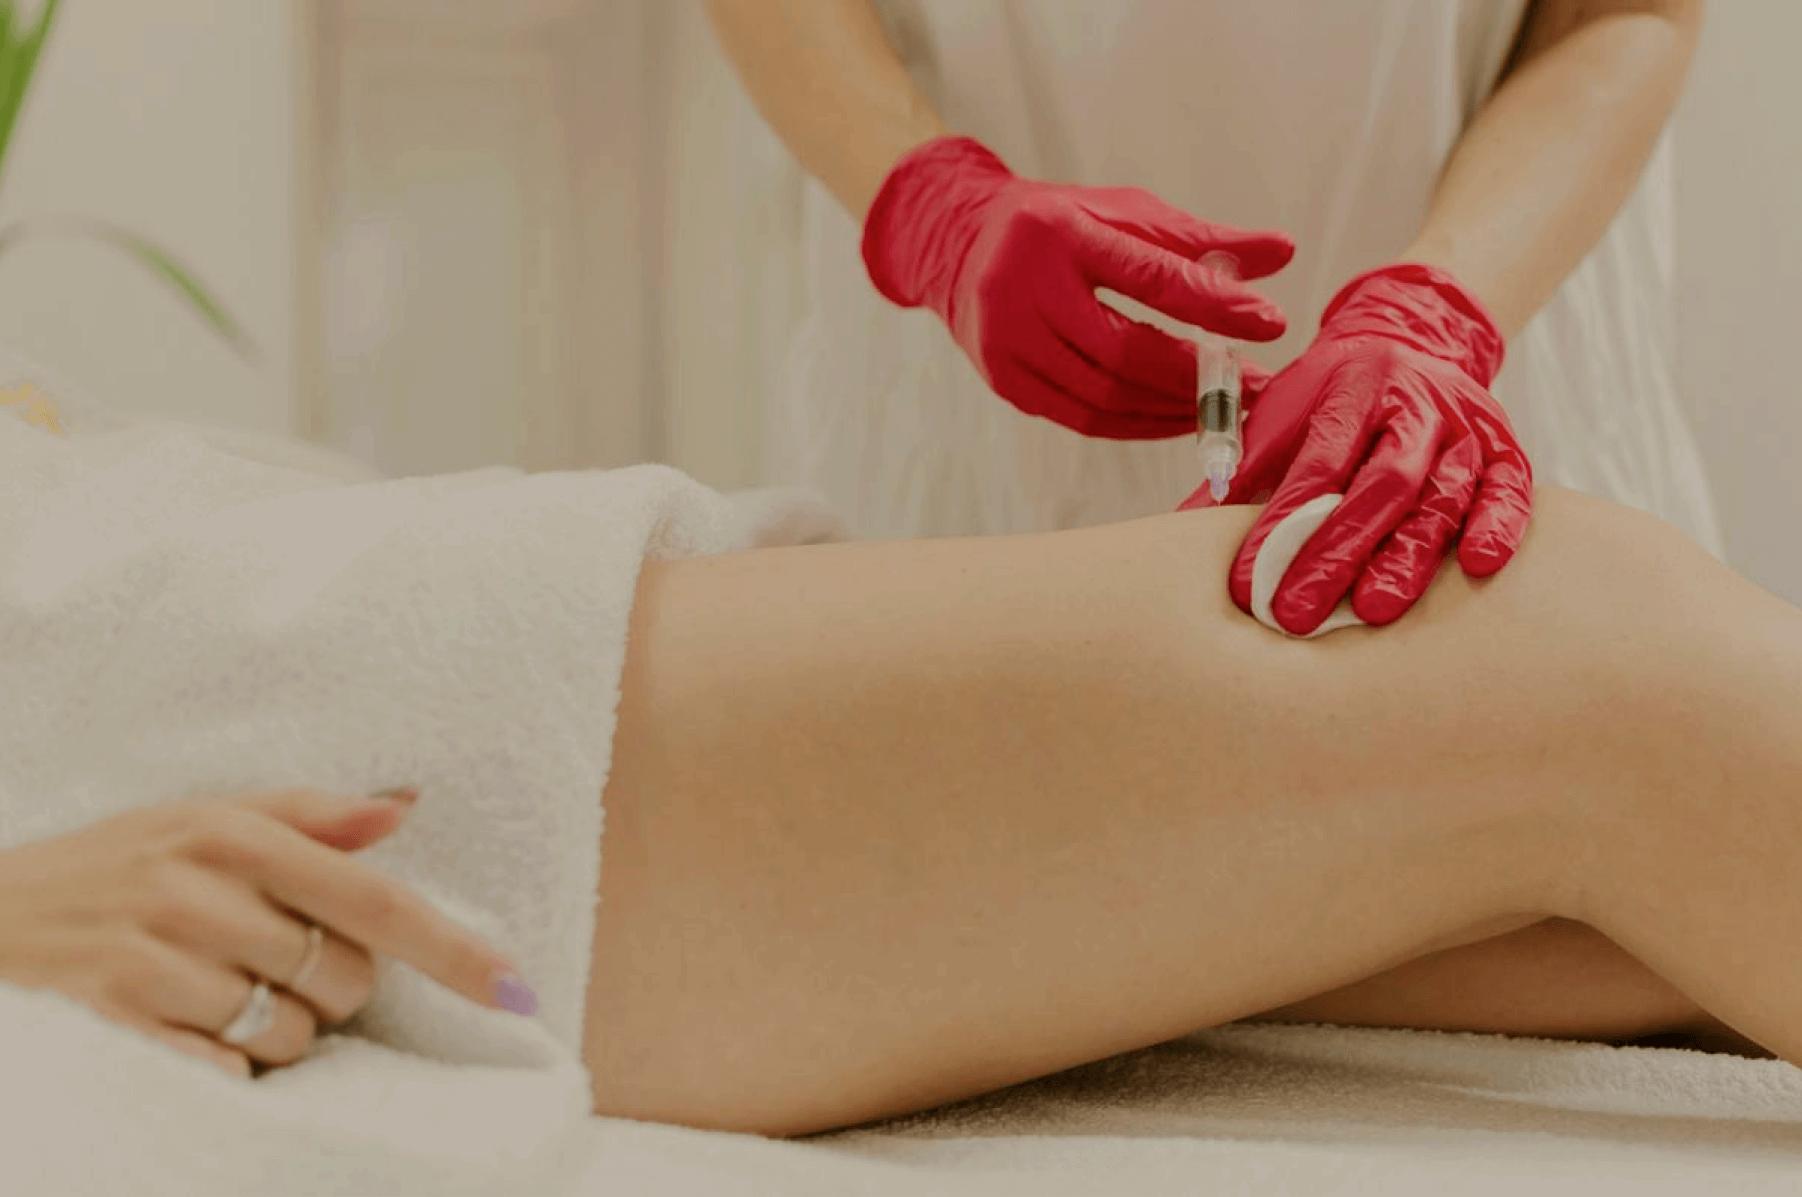 vein removal